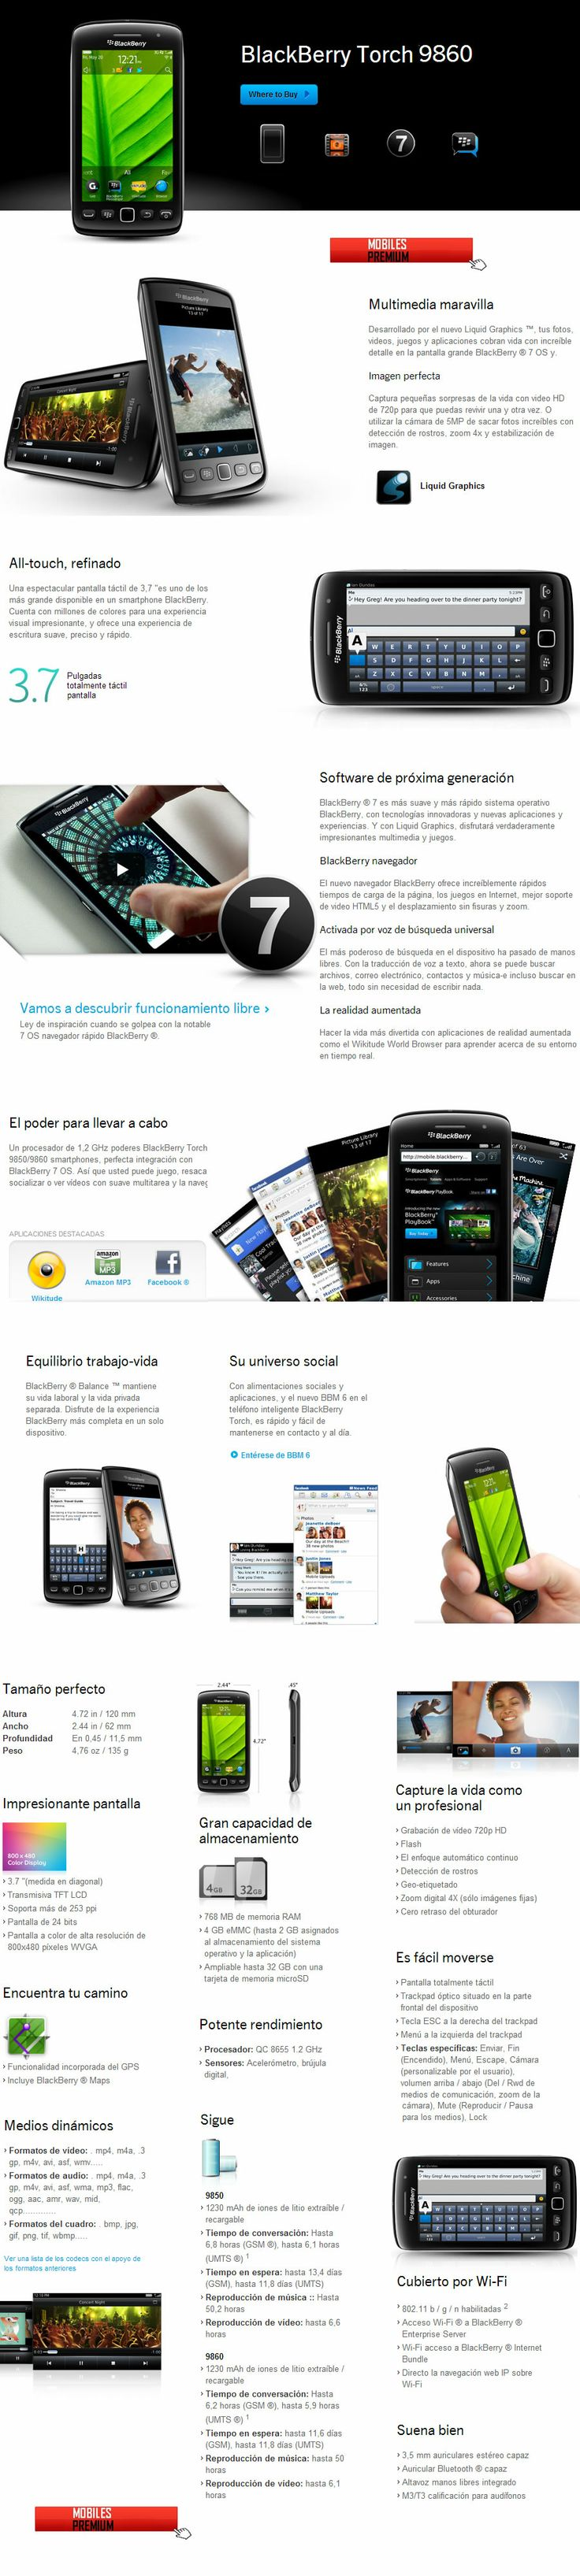 Comprar celular blackberry torch 9860 | venta de blackberry torch 9860 Argentina